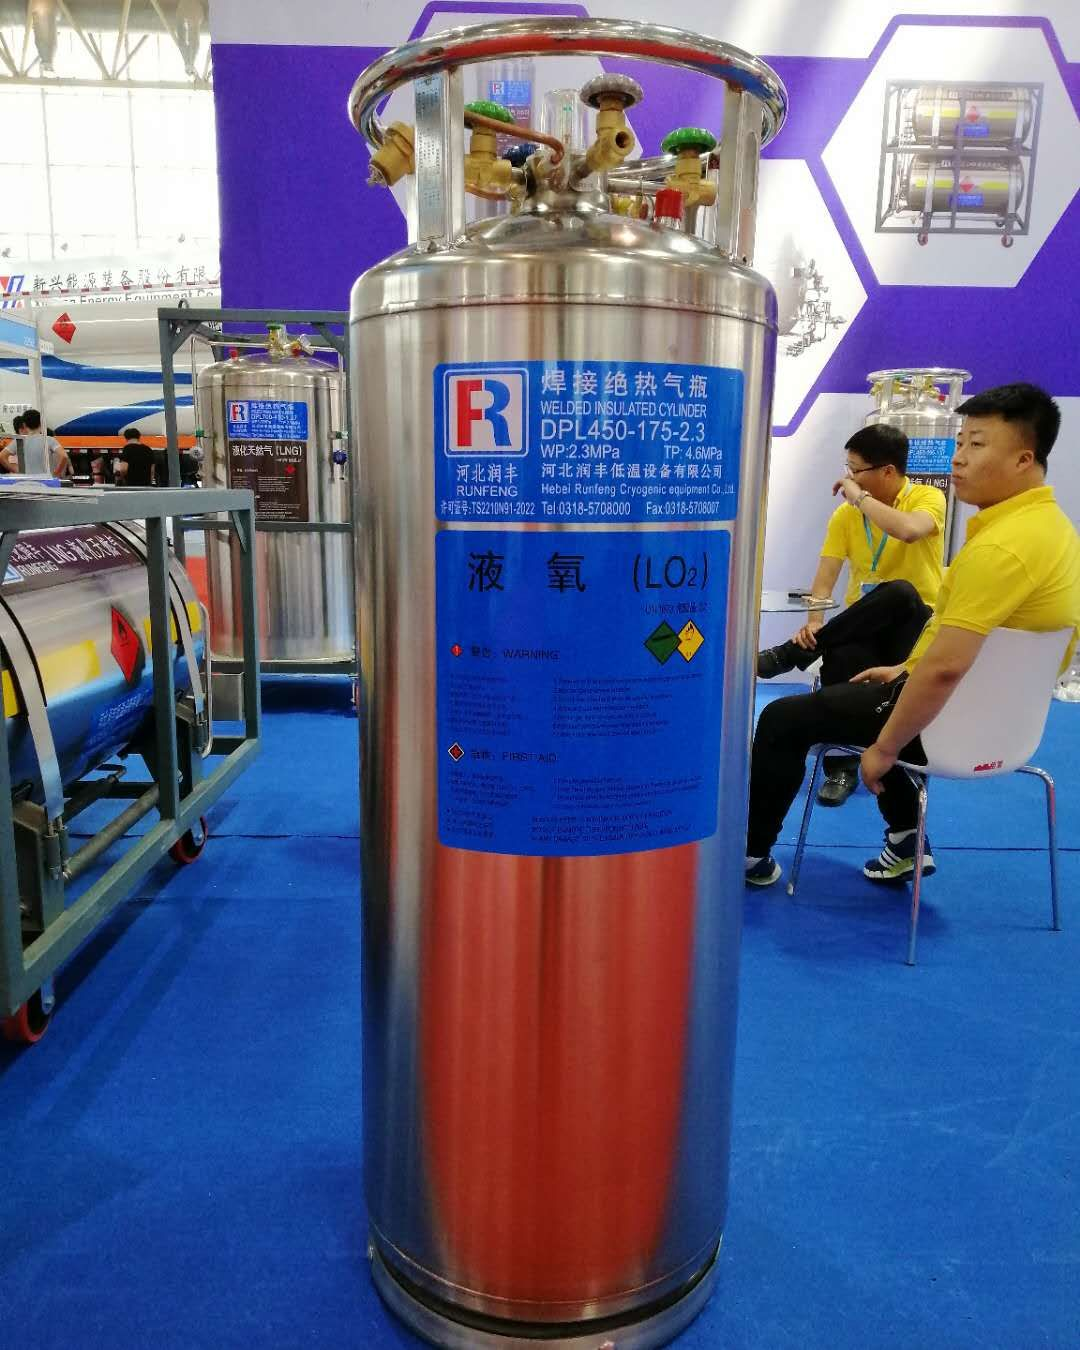 Dpl Lo2 Vertical Cryogenic Tanks Pressure Vessel Buy Small Pressure Vessels Liquid Cylinders Lo2 Vertical Cryogenic Tanks Product On Alibaba Com With Images